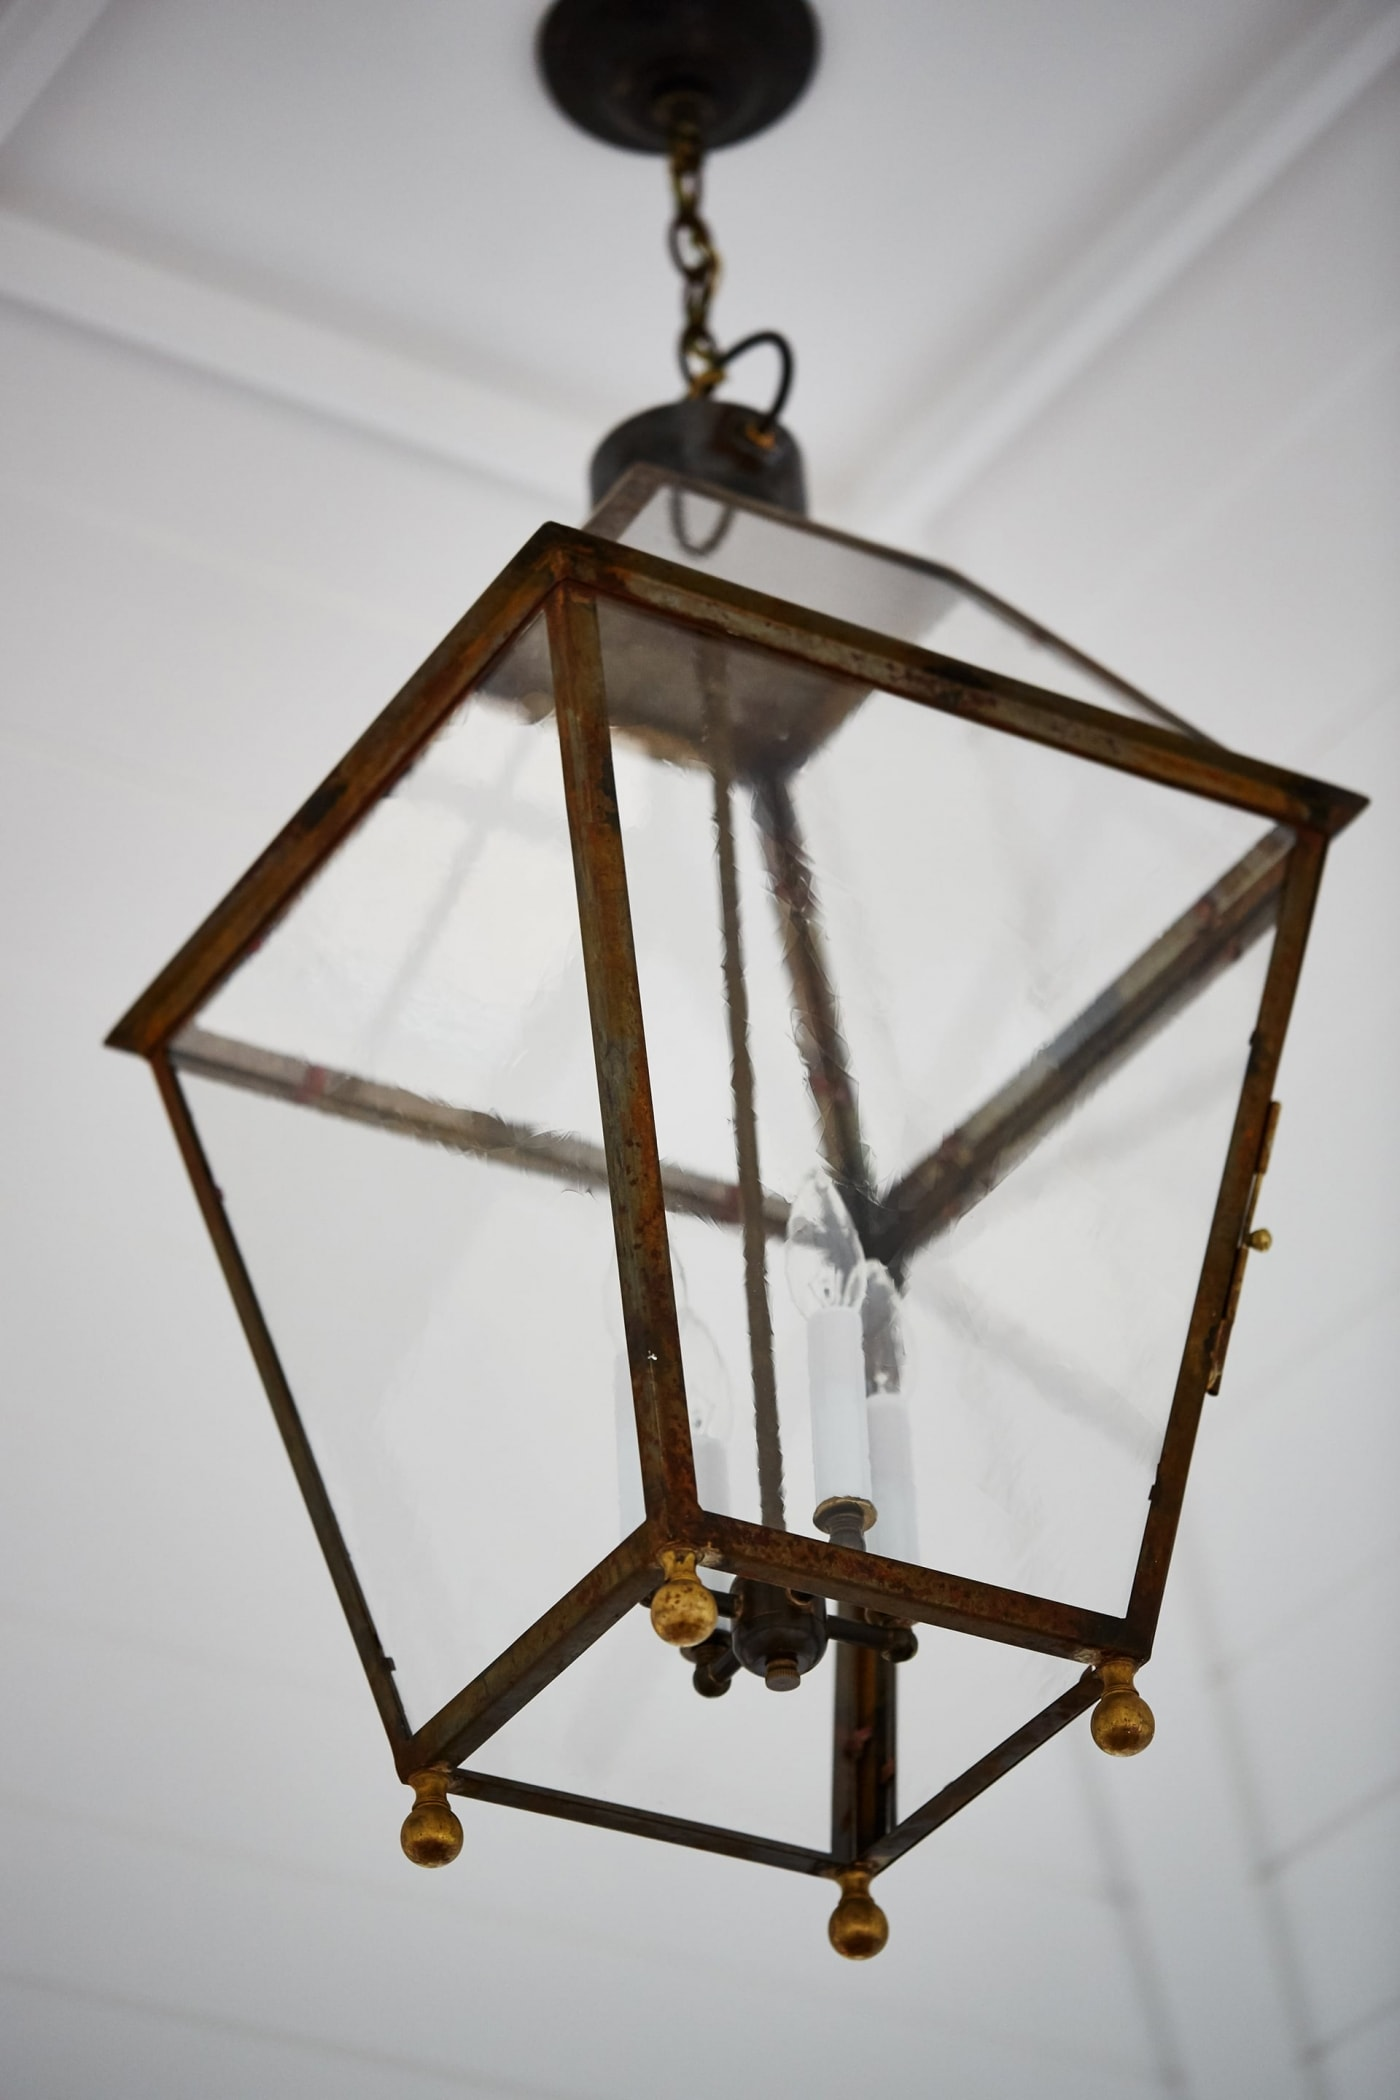 The Belvedere - Sarah off the Grid. Shop the Room! Sarah Richardson {Belvedere Rooftop Gallery} #lanternpendant #SarahRichardson